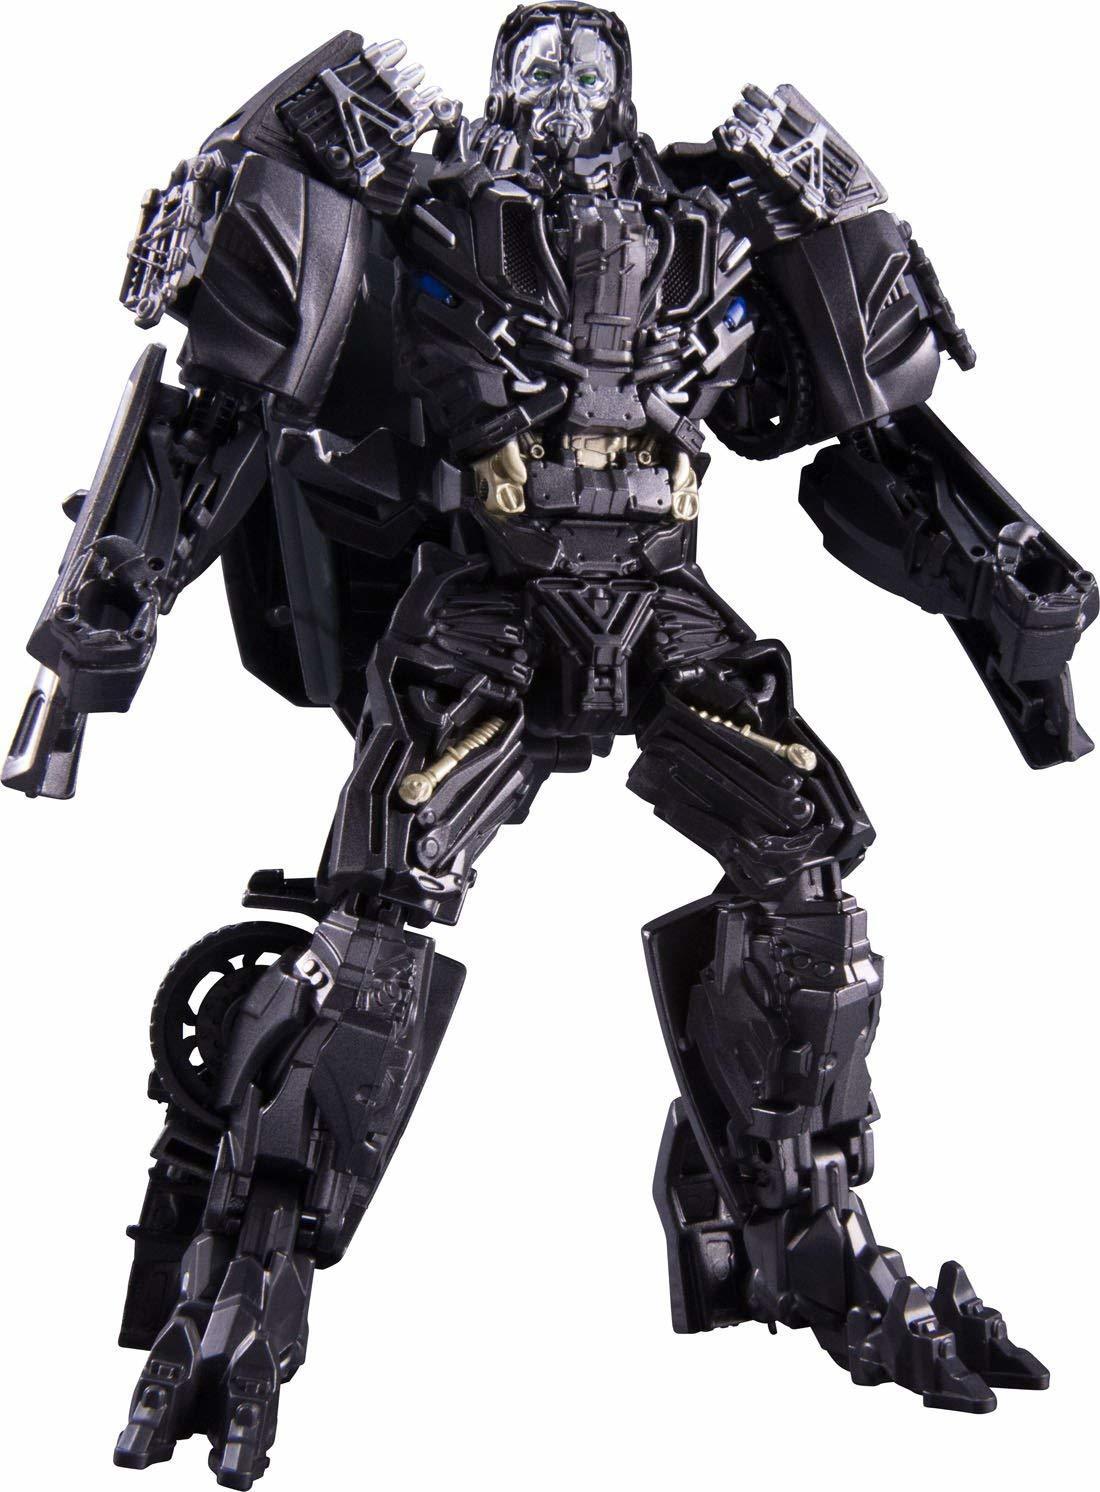 Transformers Studio Series Ss 10 Lockdown Reissue At